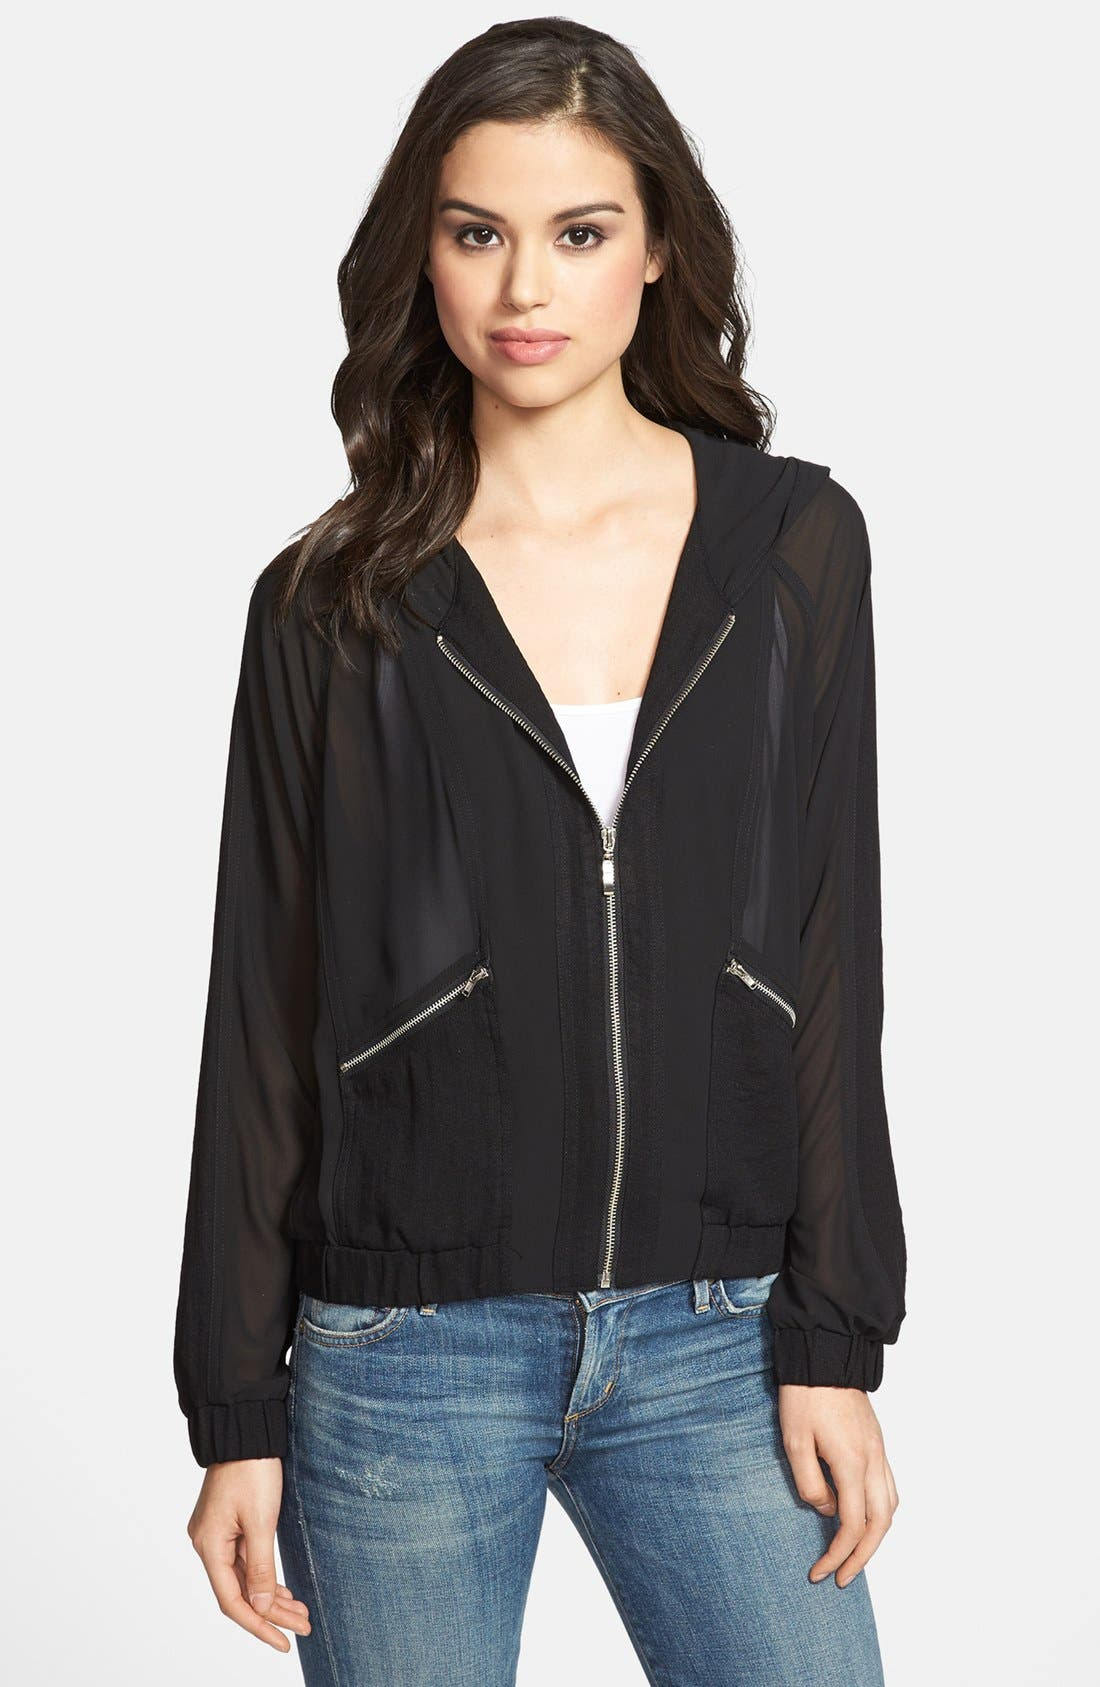 Alternate Image 1 Selected - Olivia Moon Hooded Sheer Jacket